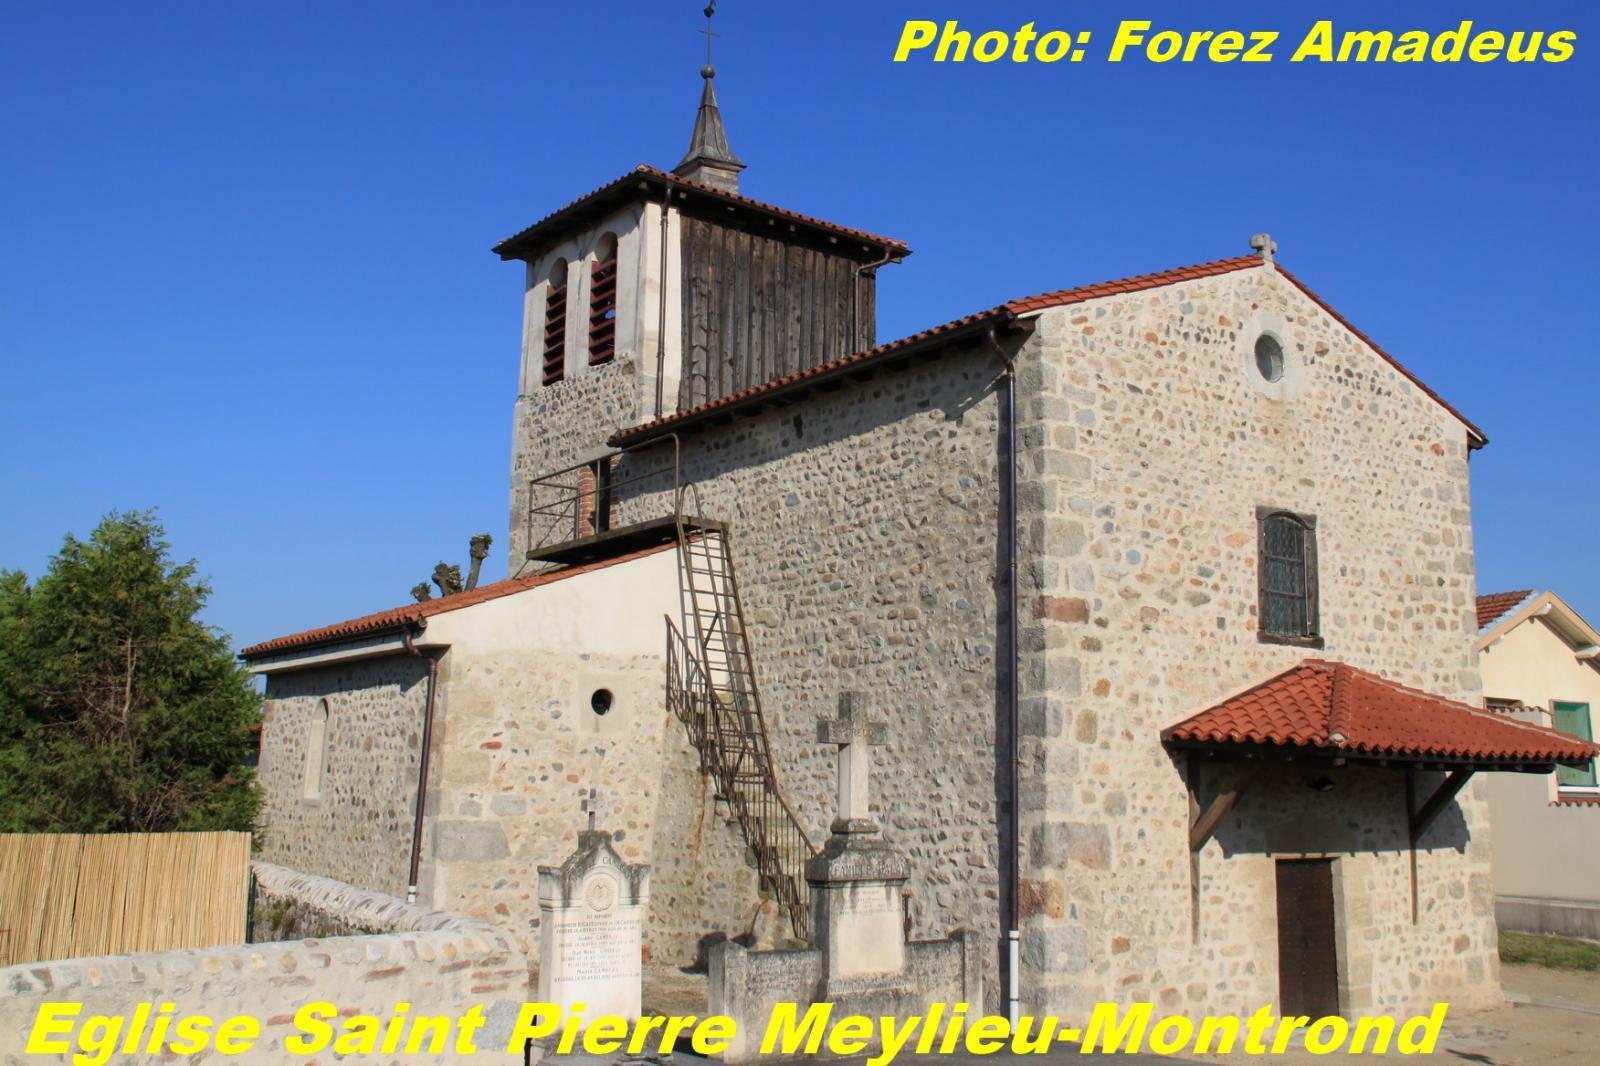 Eglise Meylieu